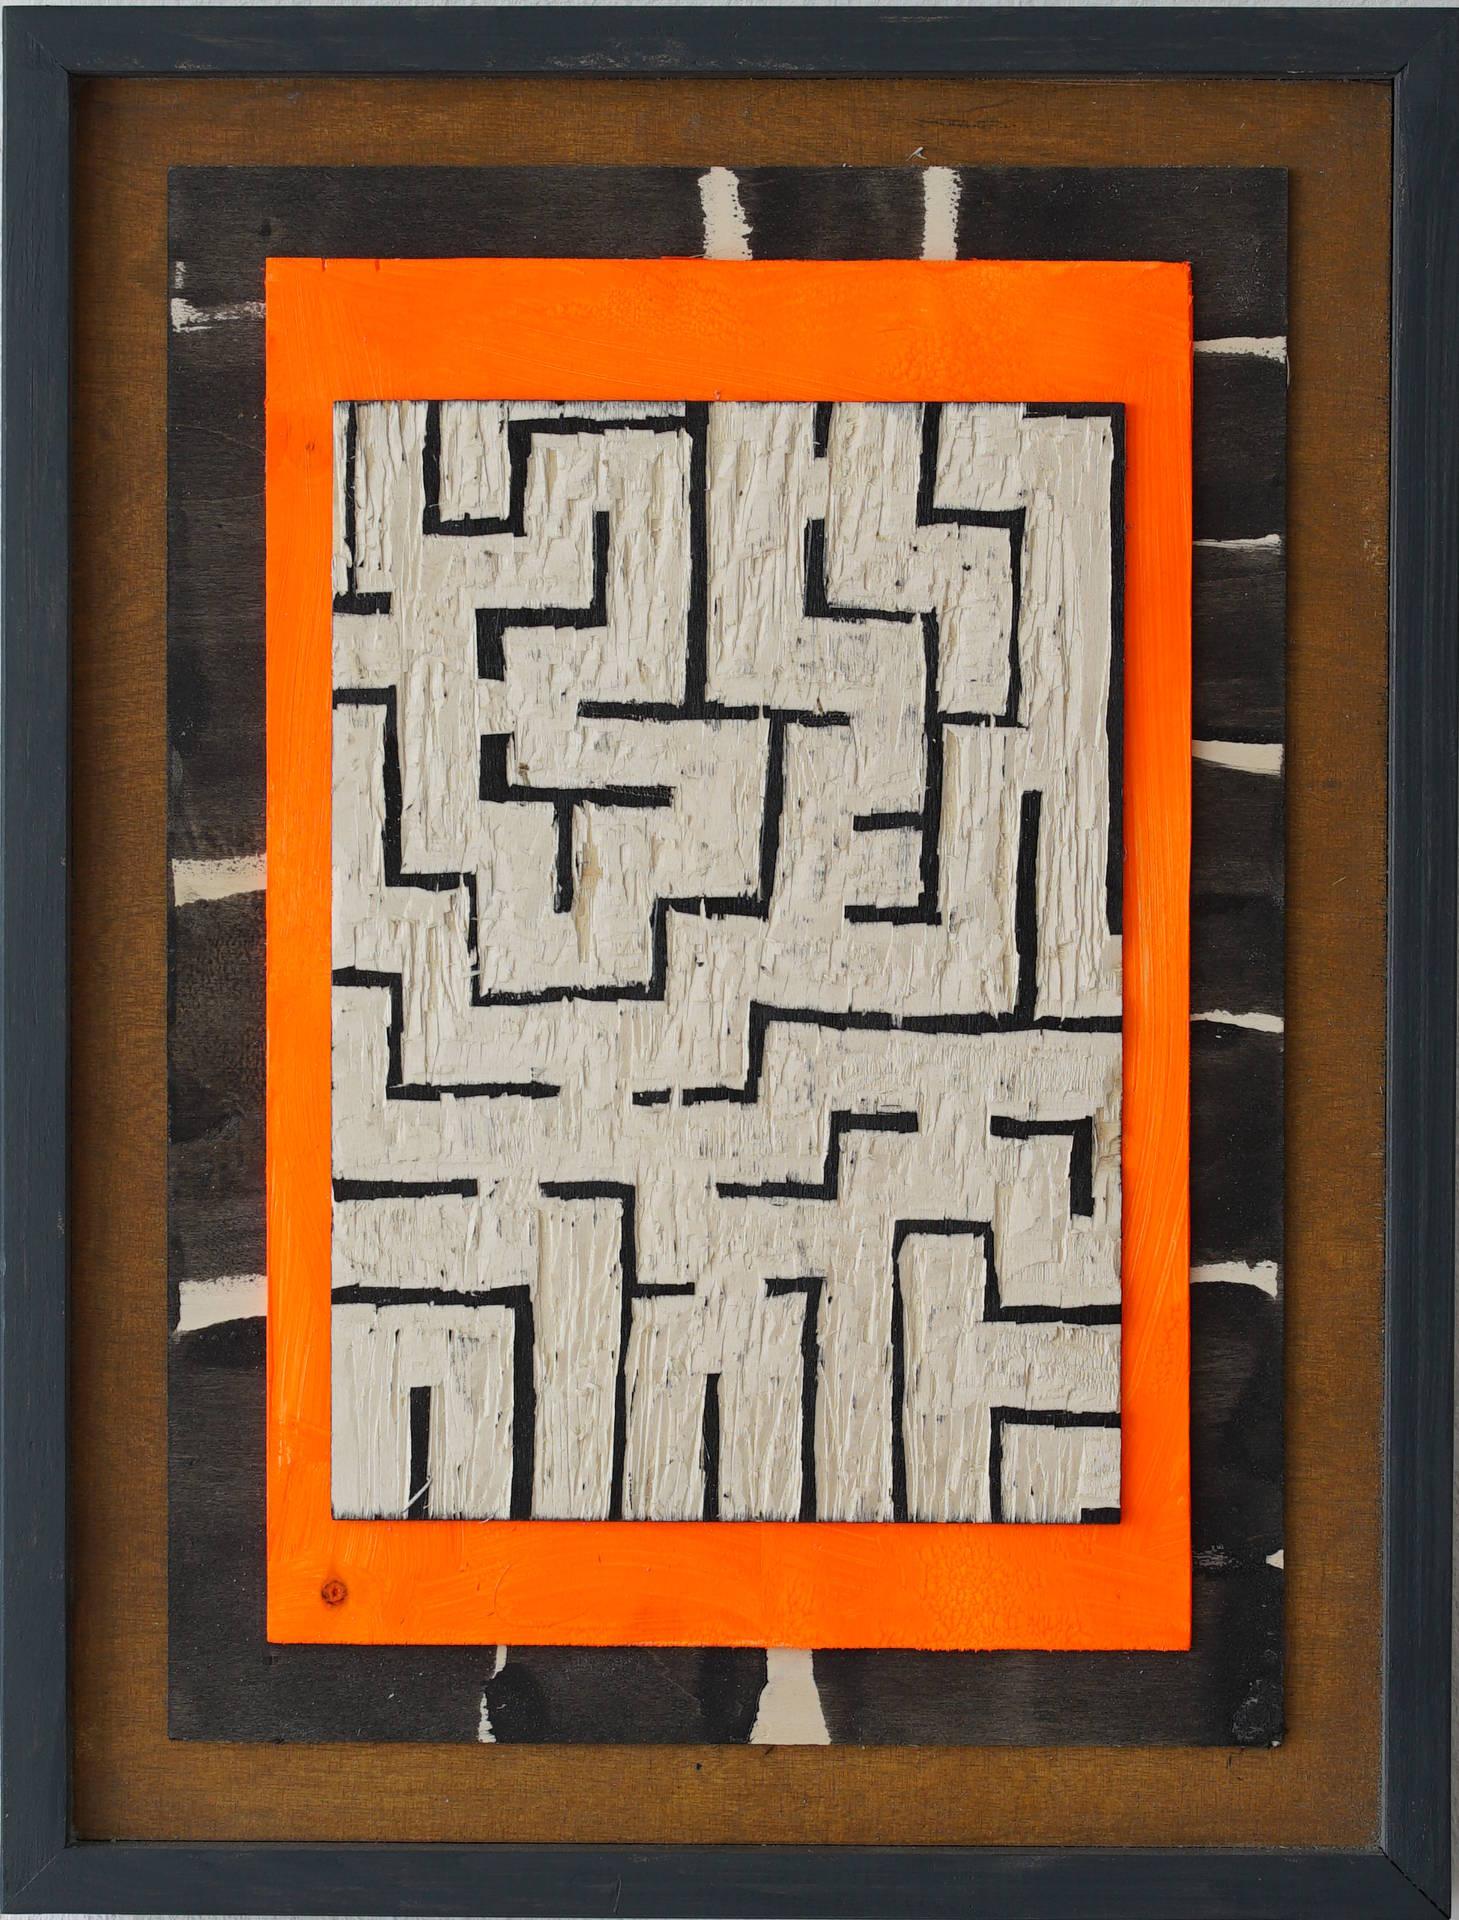 Labyrinth by Jonas Hofrichter, 2016